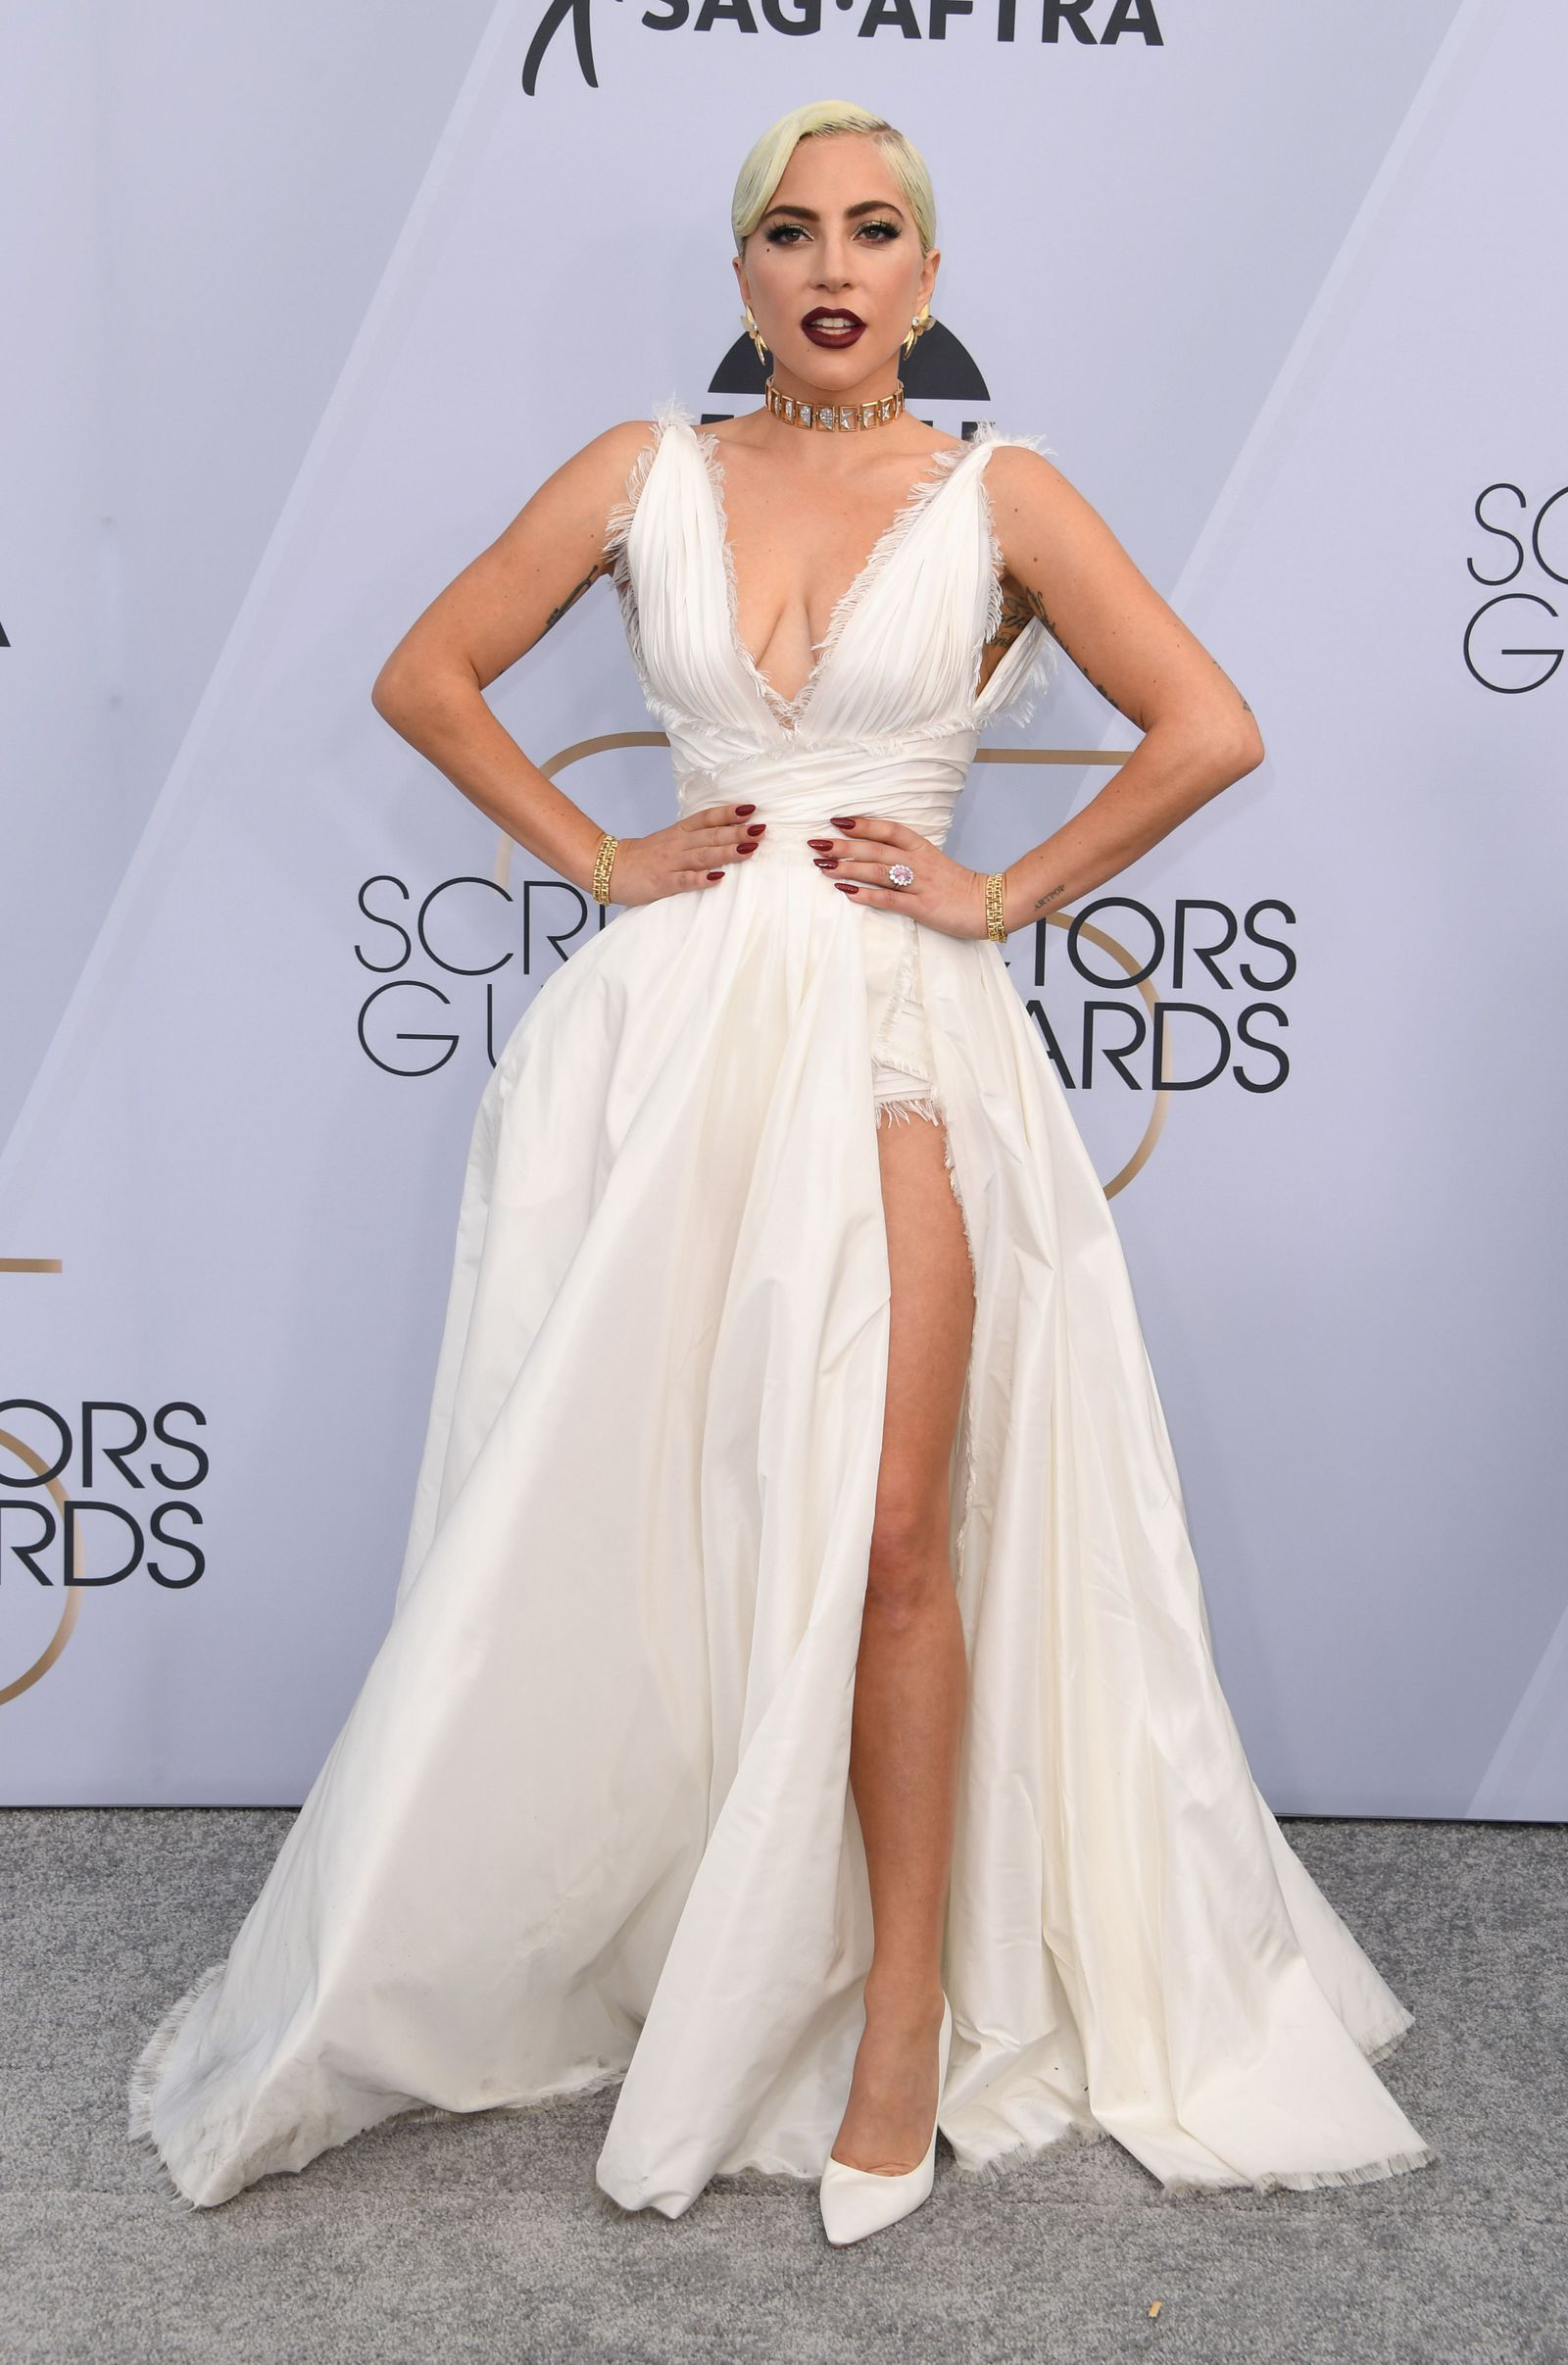 910462c3a044 Lady Gaga- at SAG awards looking gorgeous in Dior couture.  dior  ladygaga